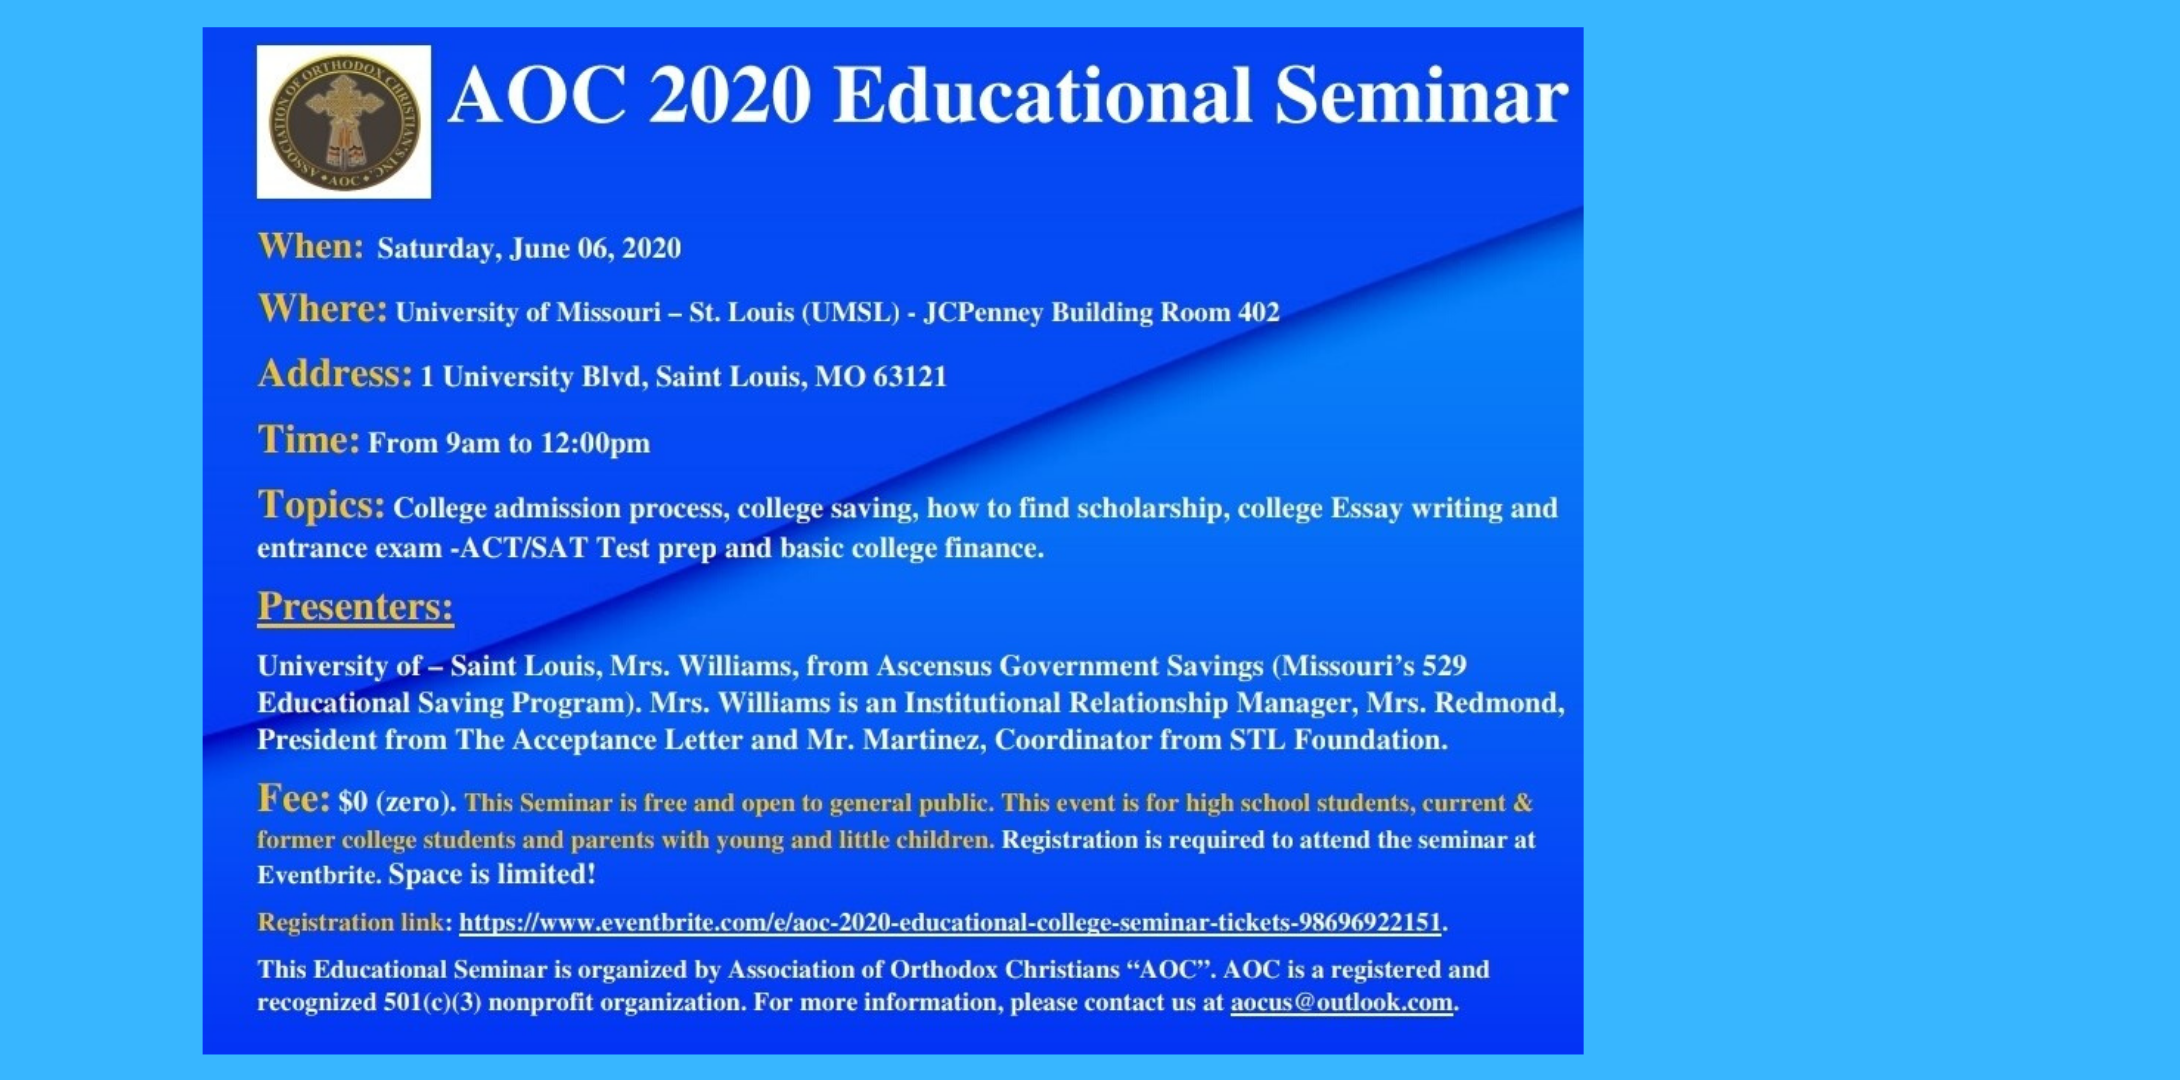 AOC 2020 Educational College Seminar